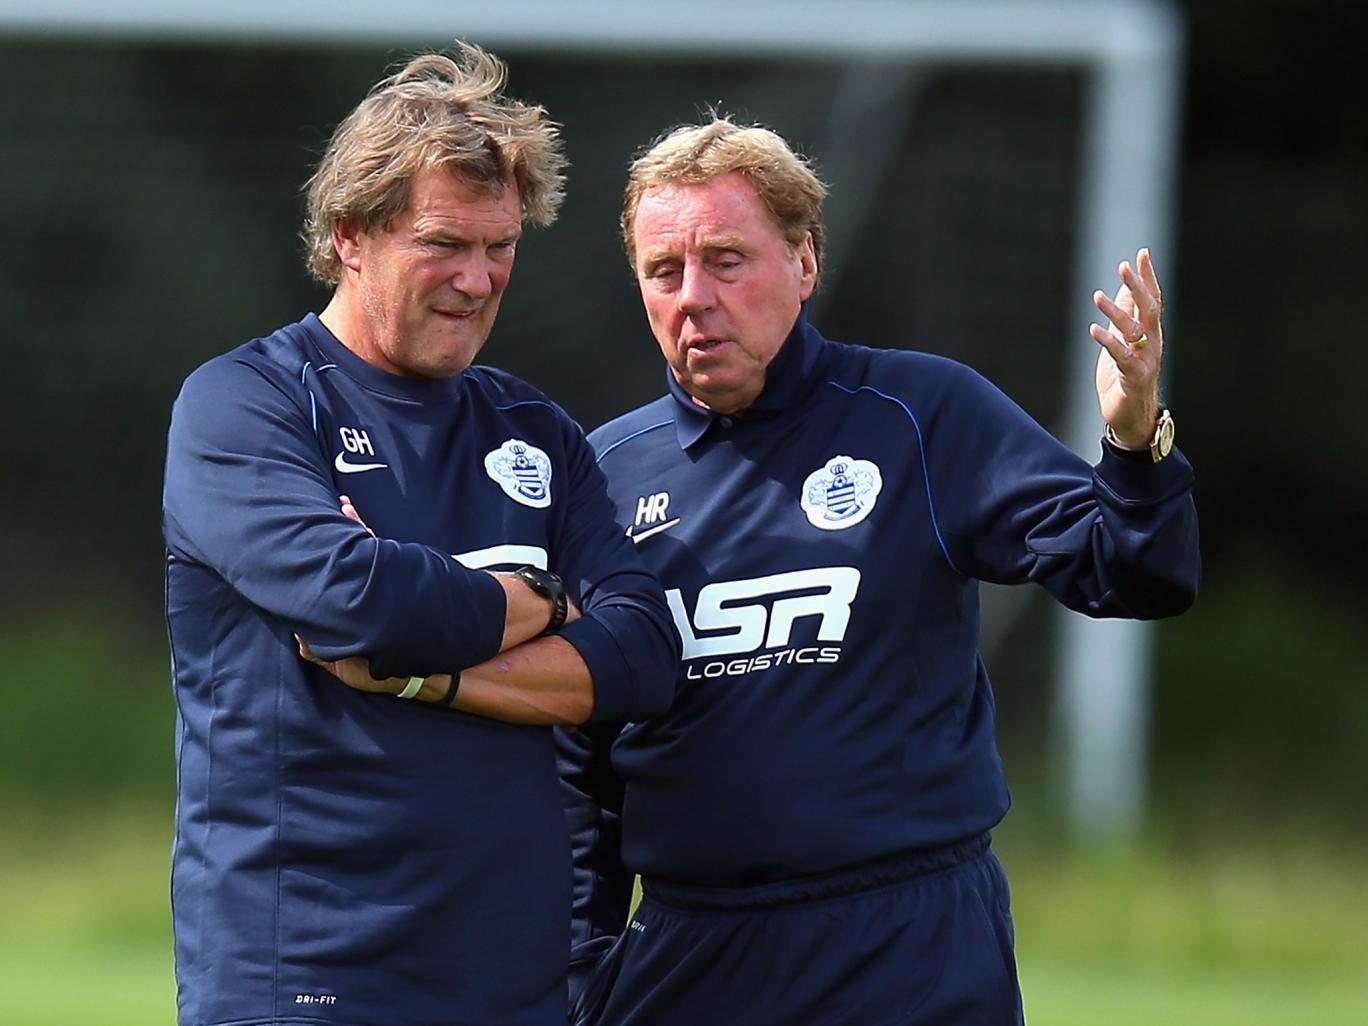 Brains trust: Glenn Hoddle (left) discusses tactics with Harry Redknapp